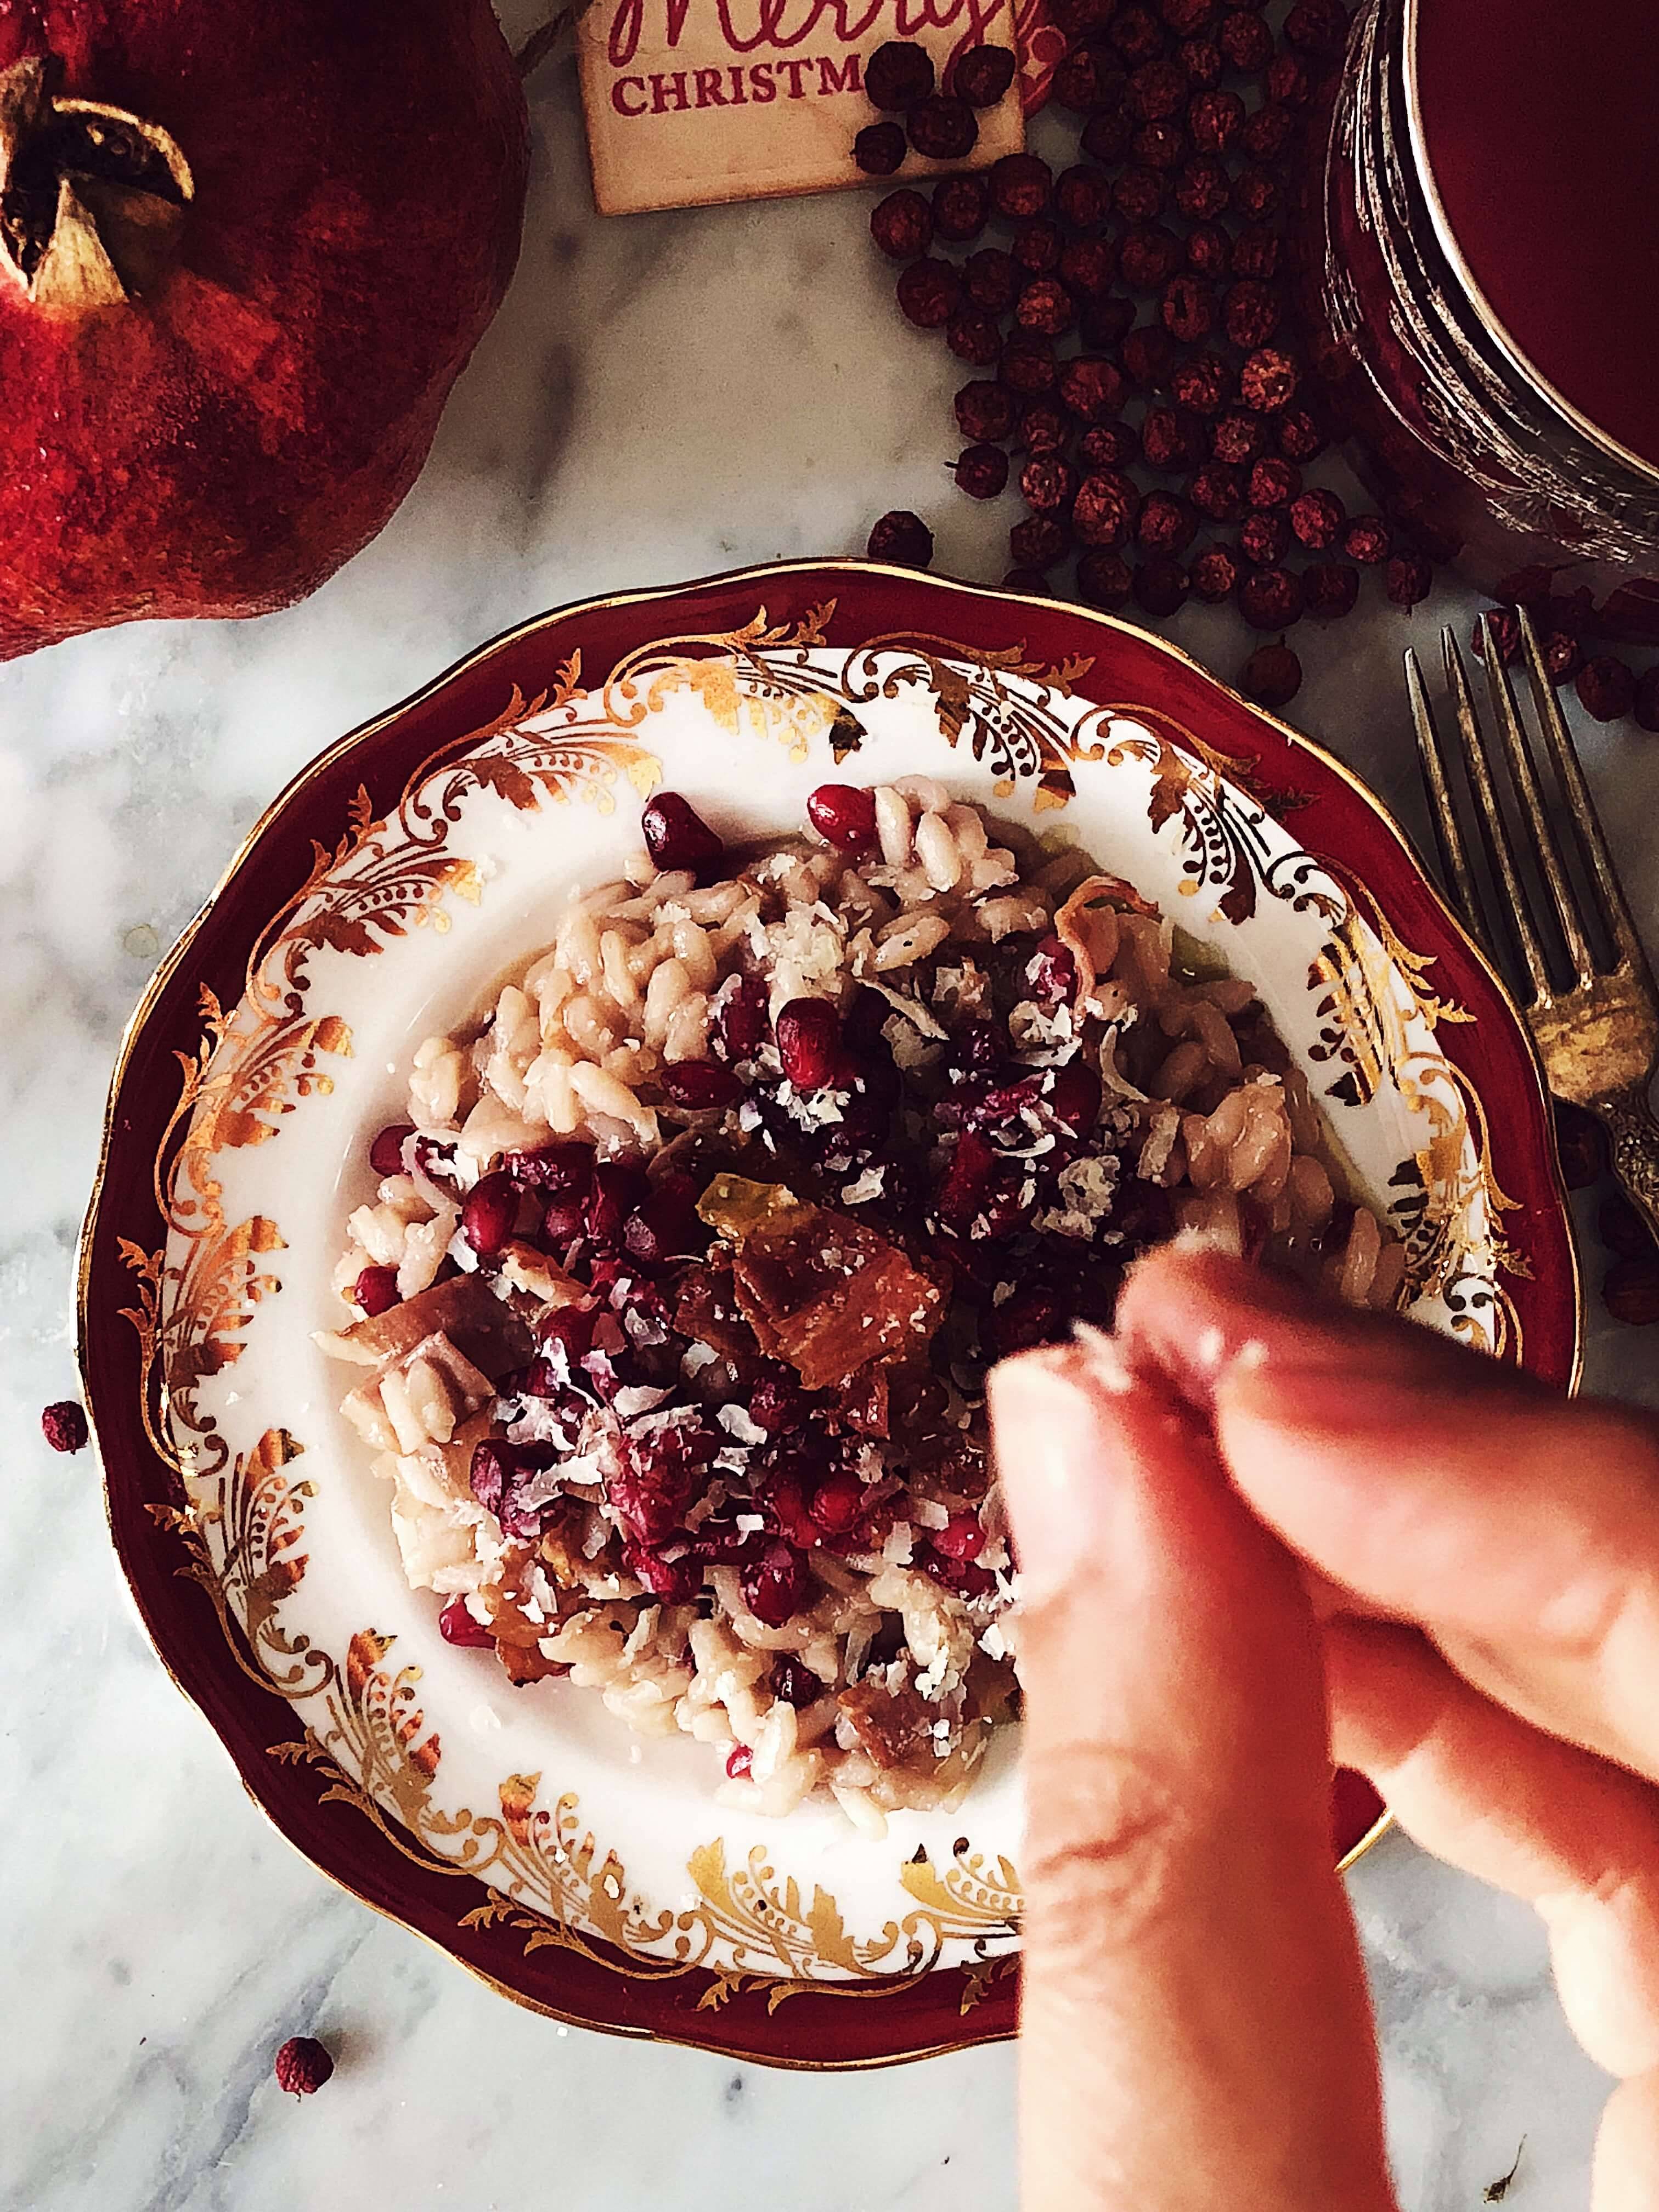 Italian cuisine magazine: pomegranate risotto #thegourmetmag #christmasrecipes